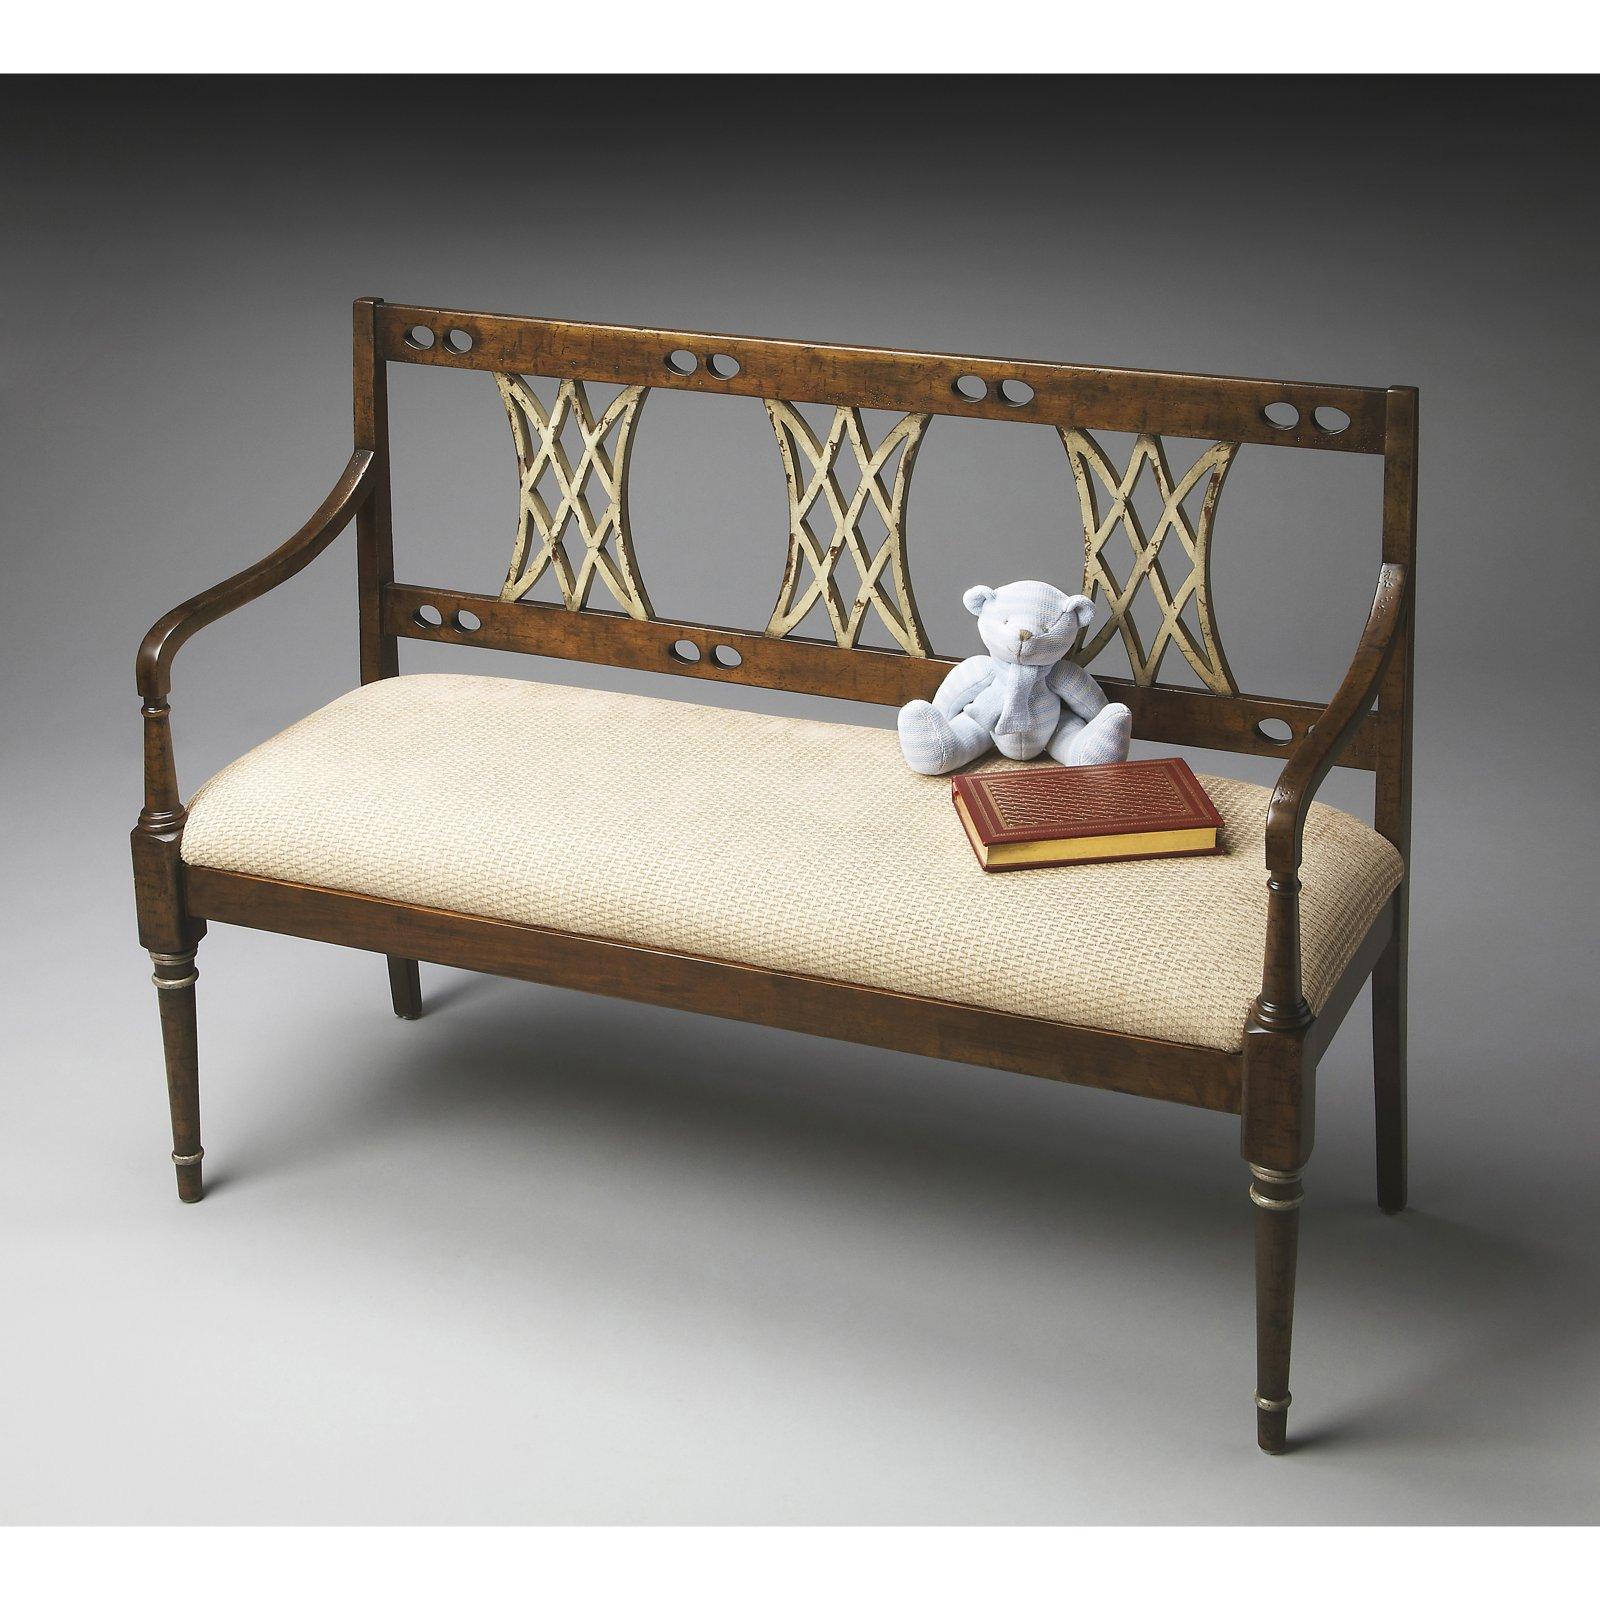 Butler Bench - Appaloosa